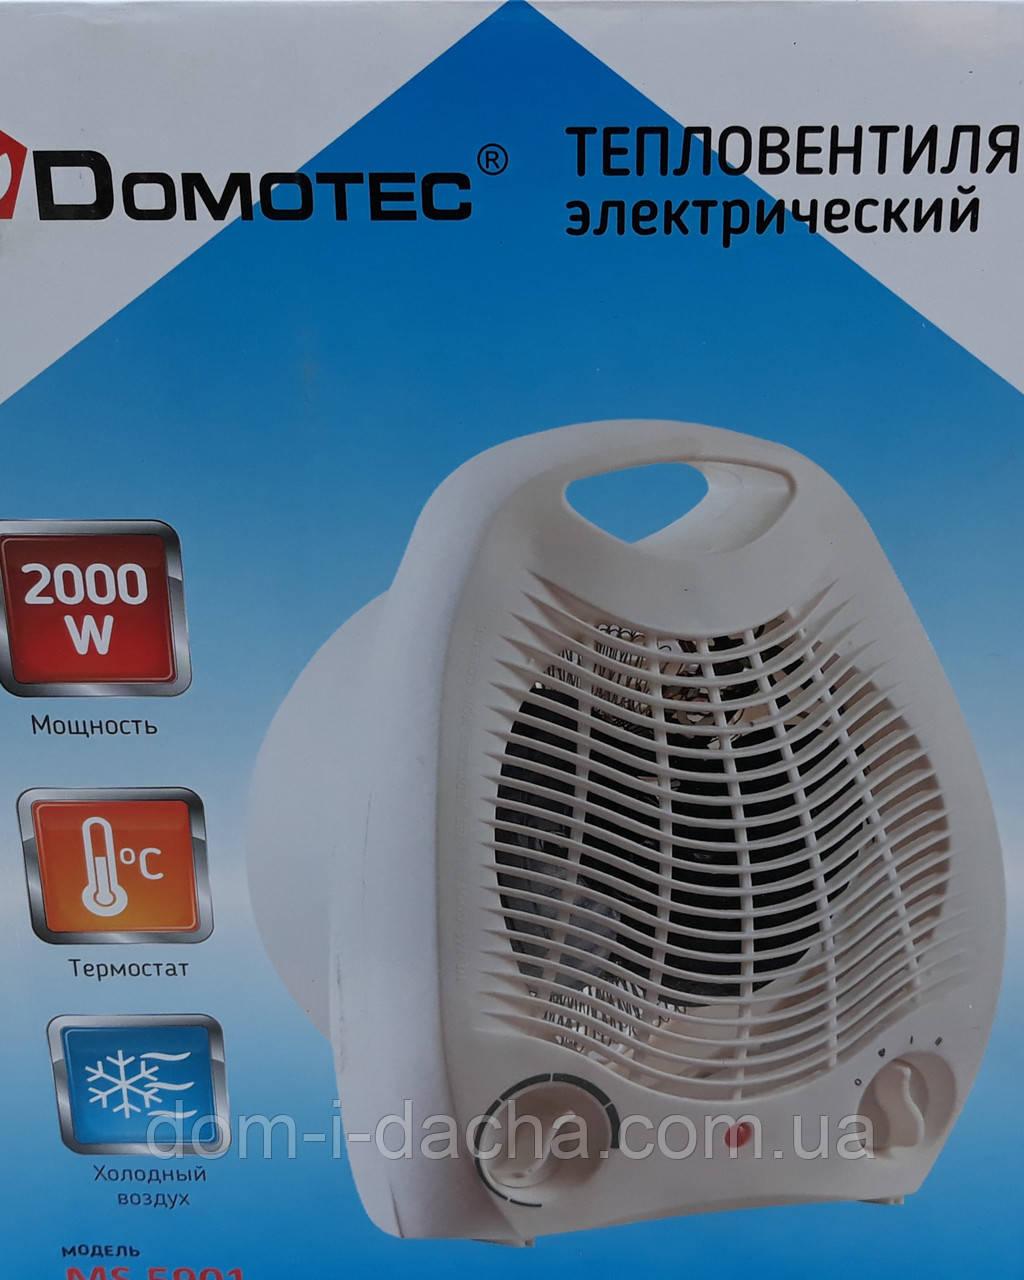 Тепловентилятор Domotec MS 5901